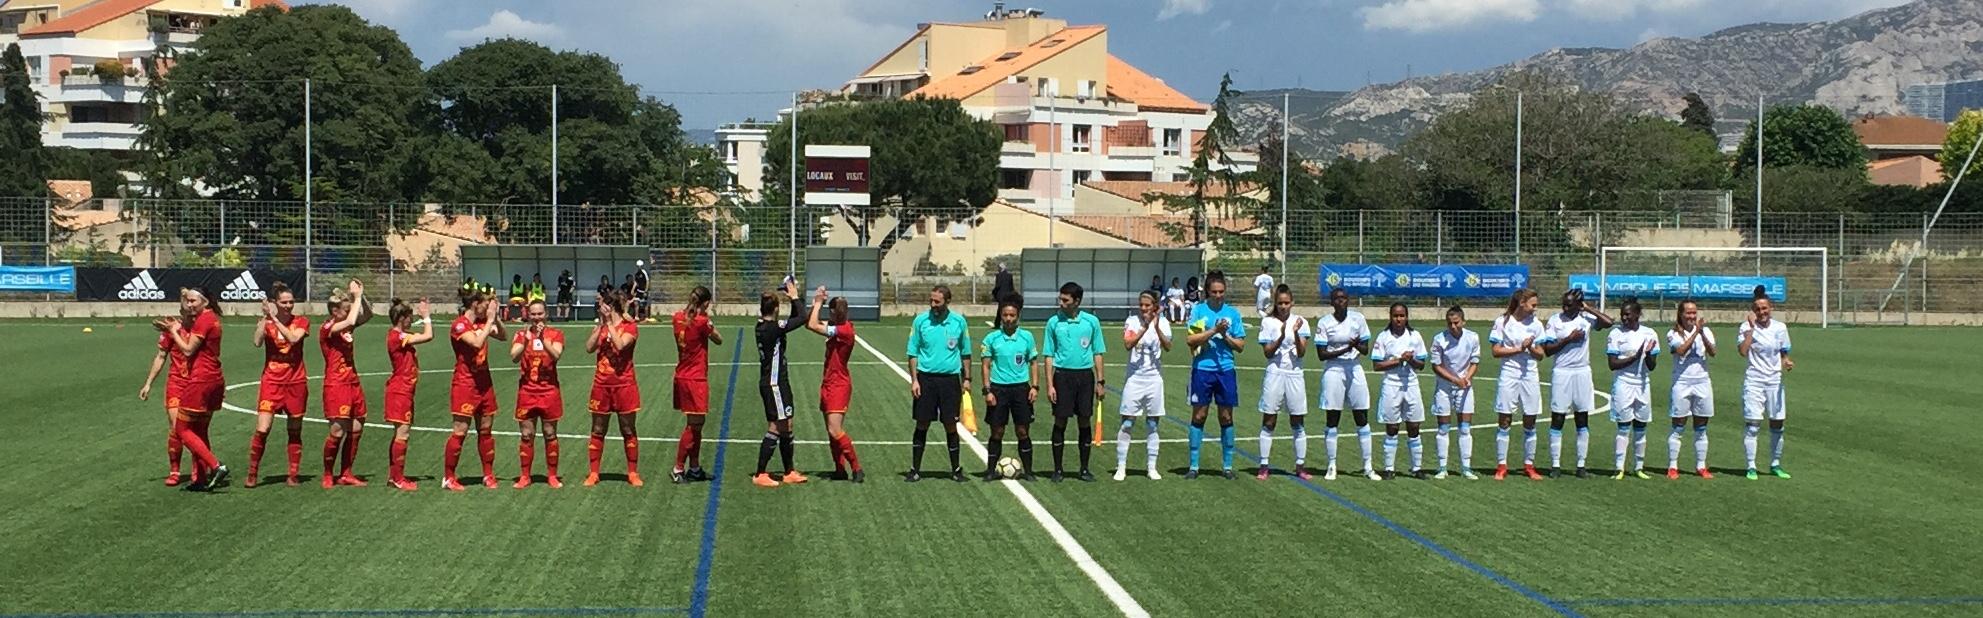 21 e journée  19 mai : 15 H  : o de Marseille vs rafettes  Fullsizeoutput_8c6